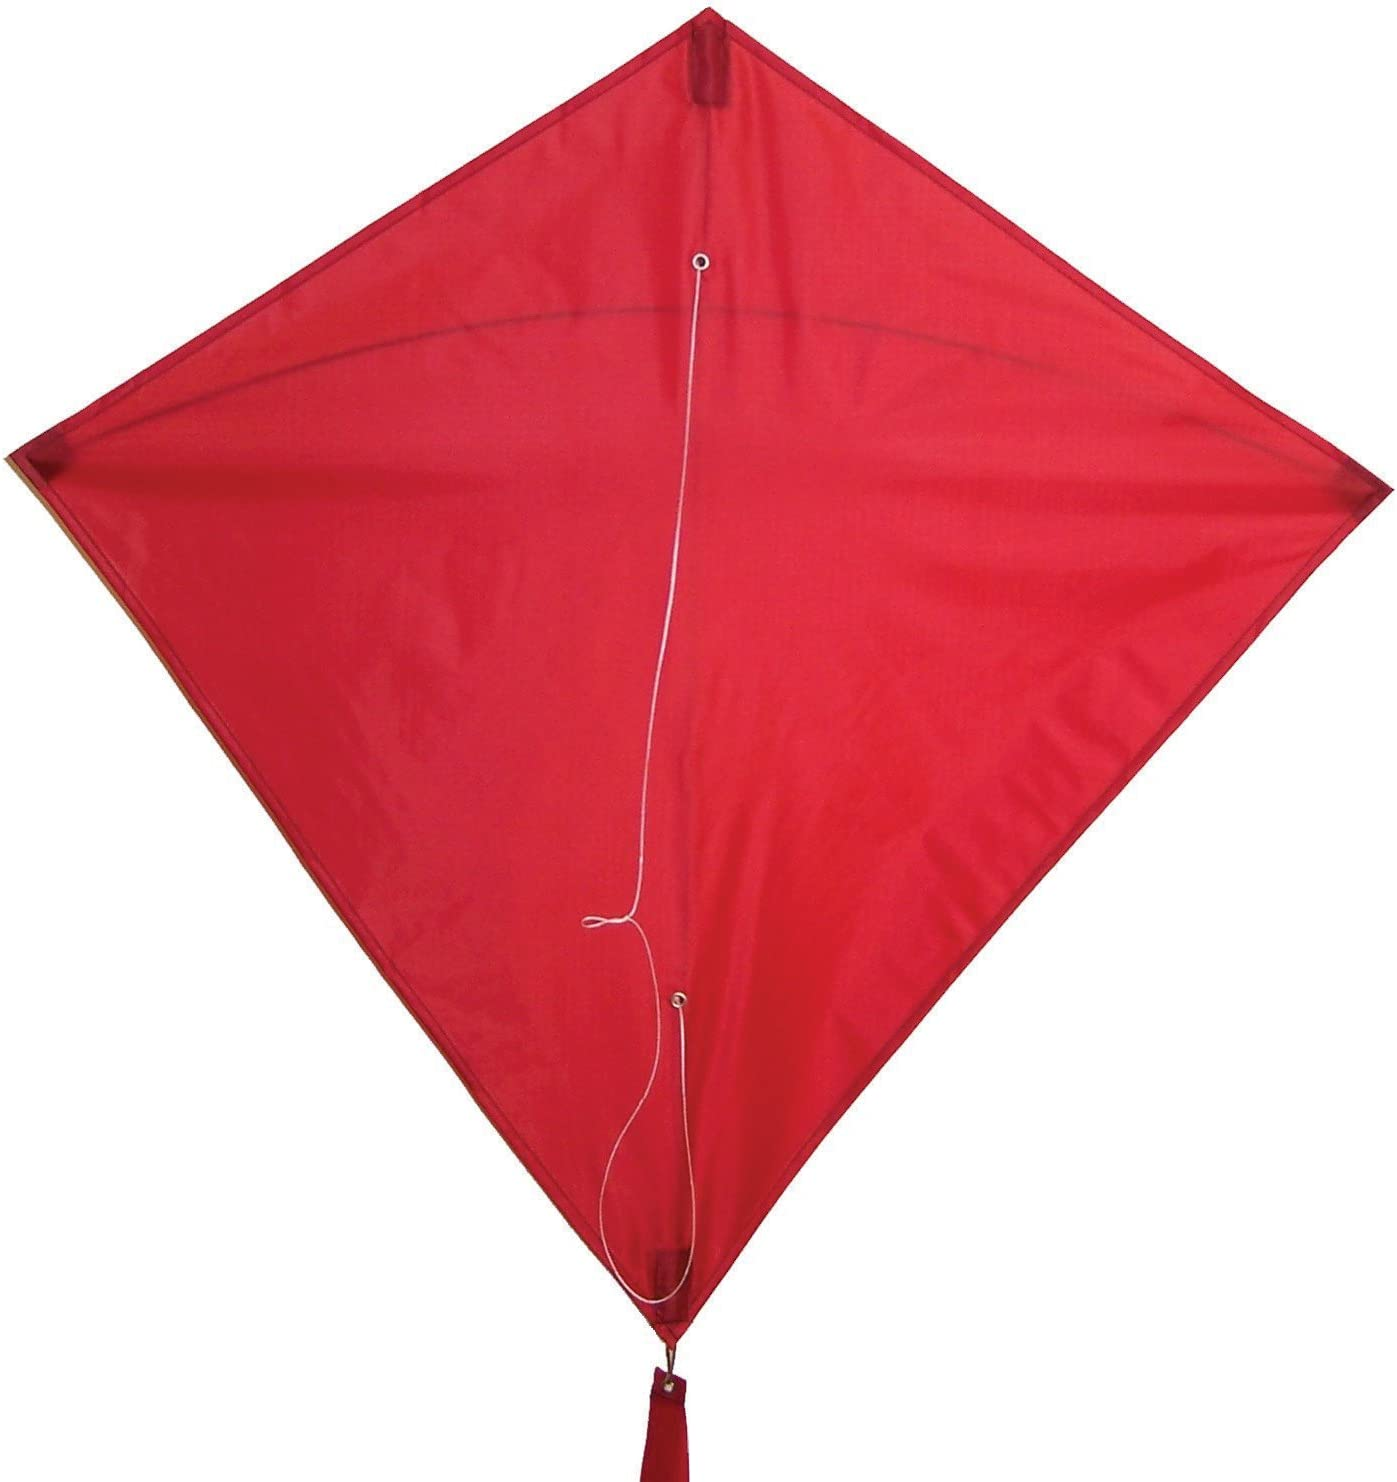 In the Breeze Red 30 Inch Diamond Kite - Single Line - Ripstop F